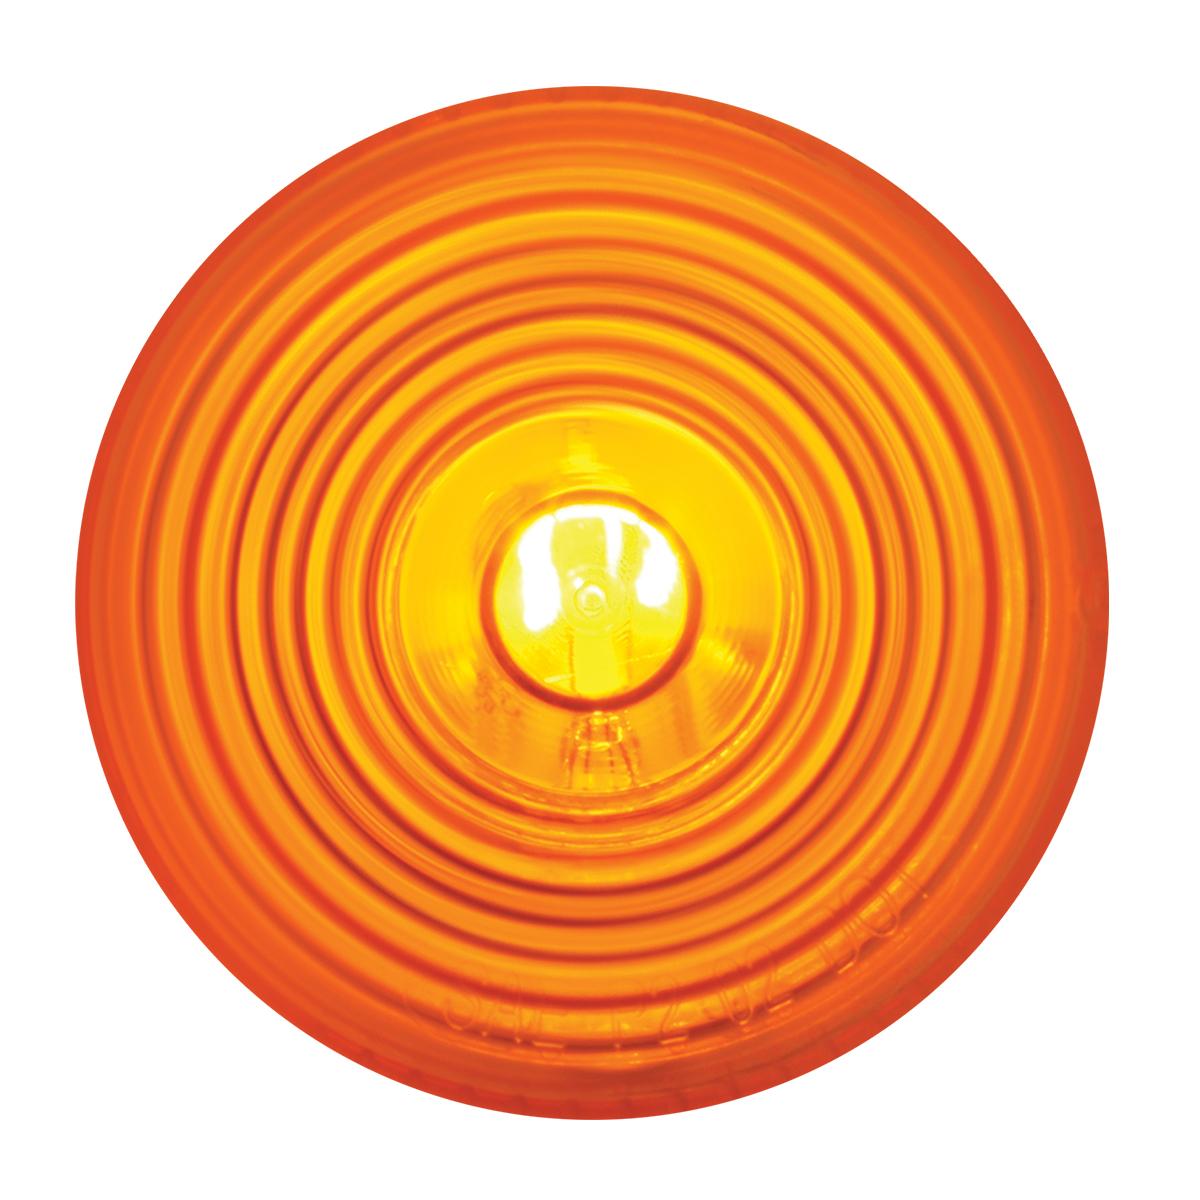 "#80723 2"" Sealed Incandescent Flat Amber/Amber Light"